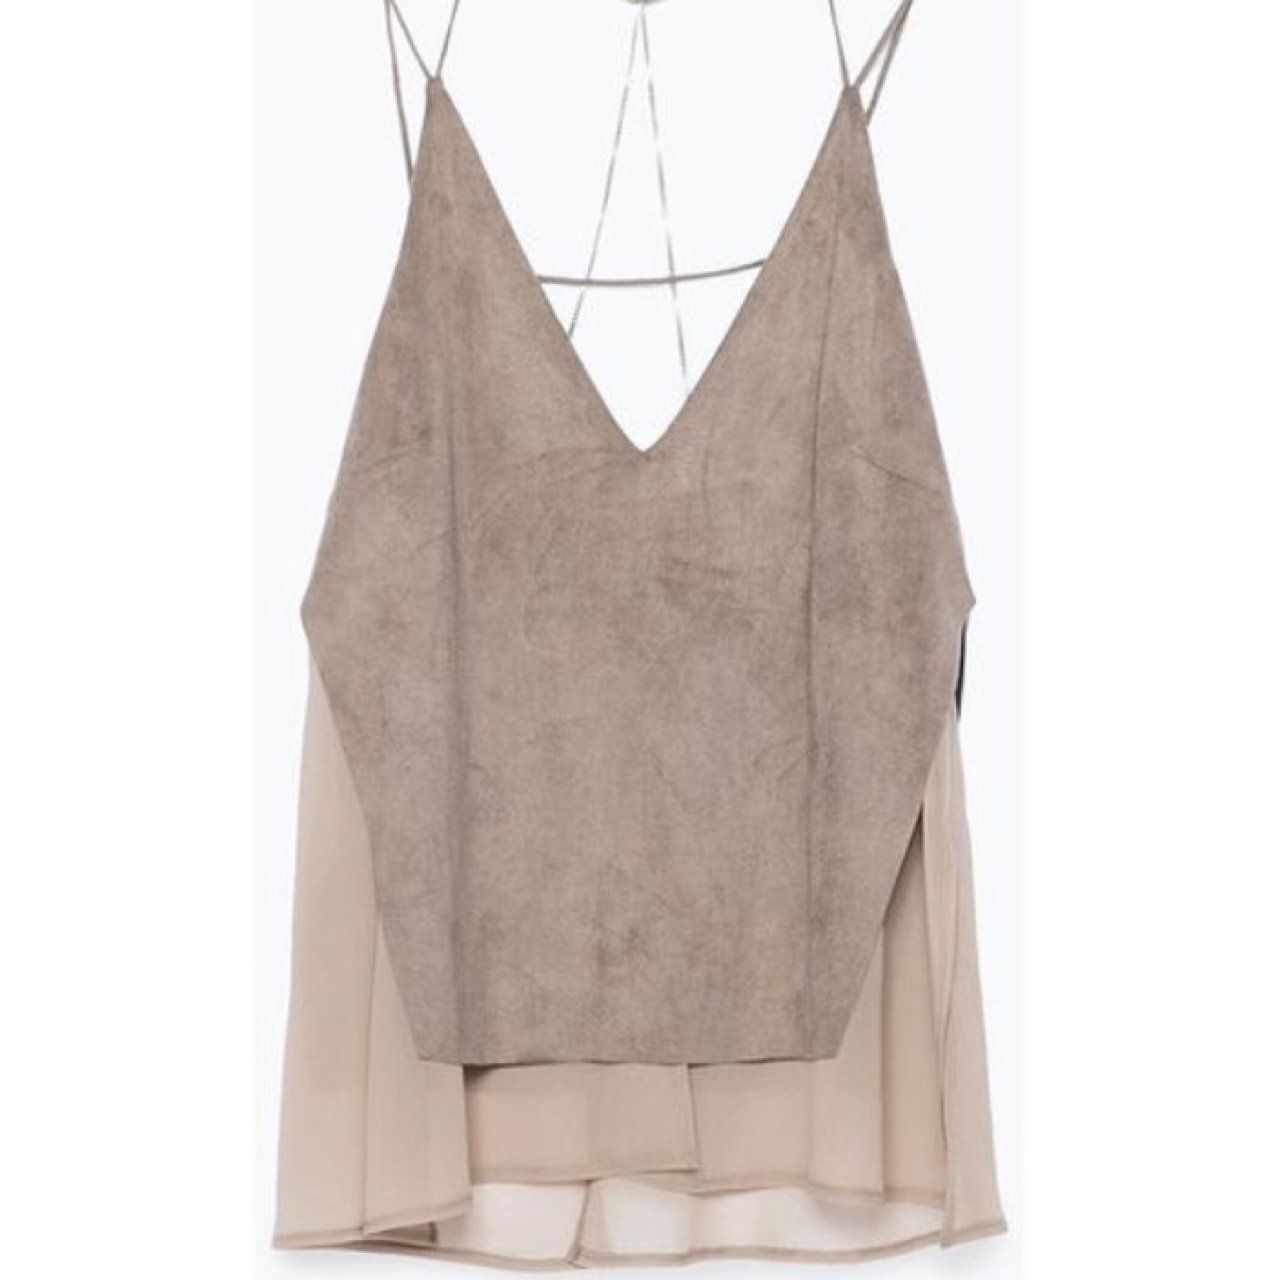 Gorgeous suede Zara top. Chain detail back. #zara #suede #chains #top #nightout #dinnerdate #backless #elegant #